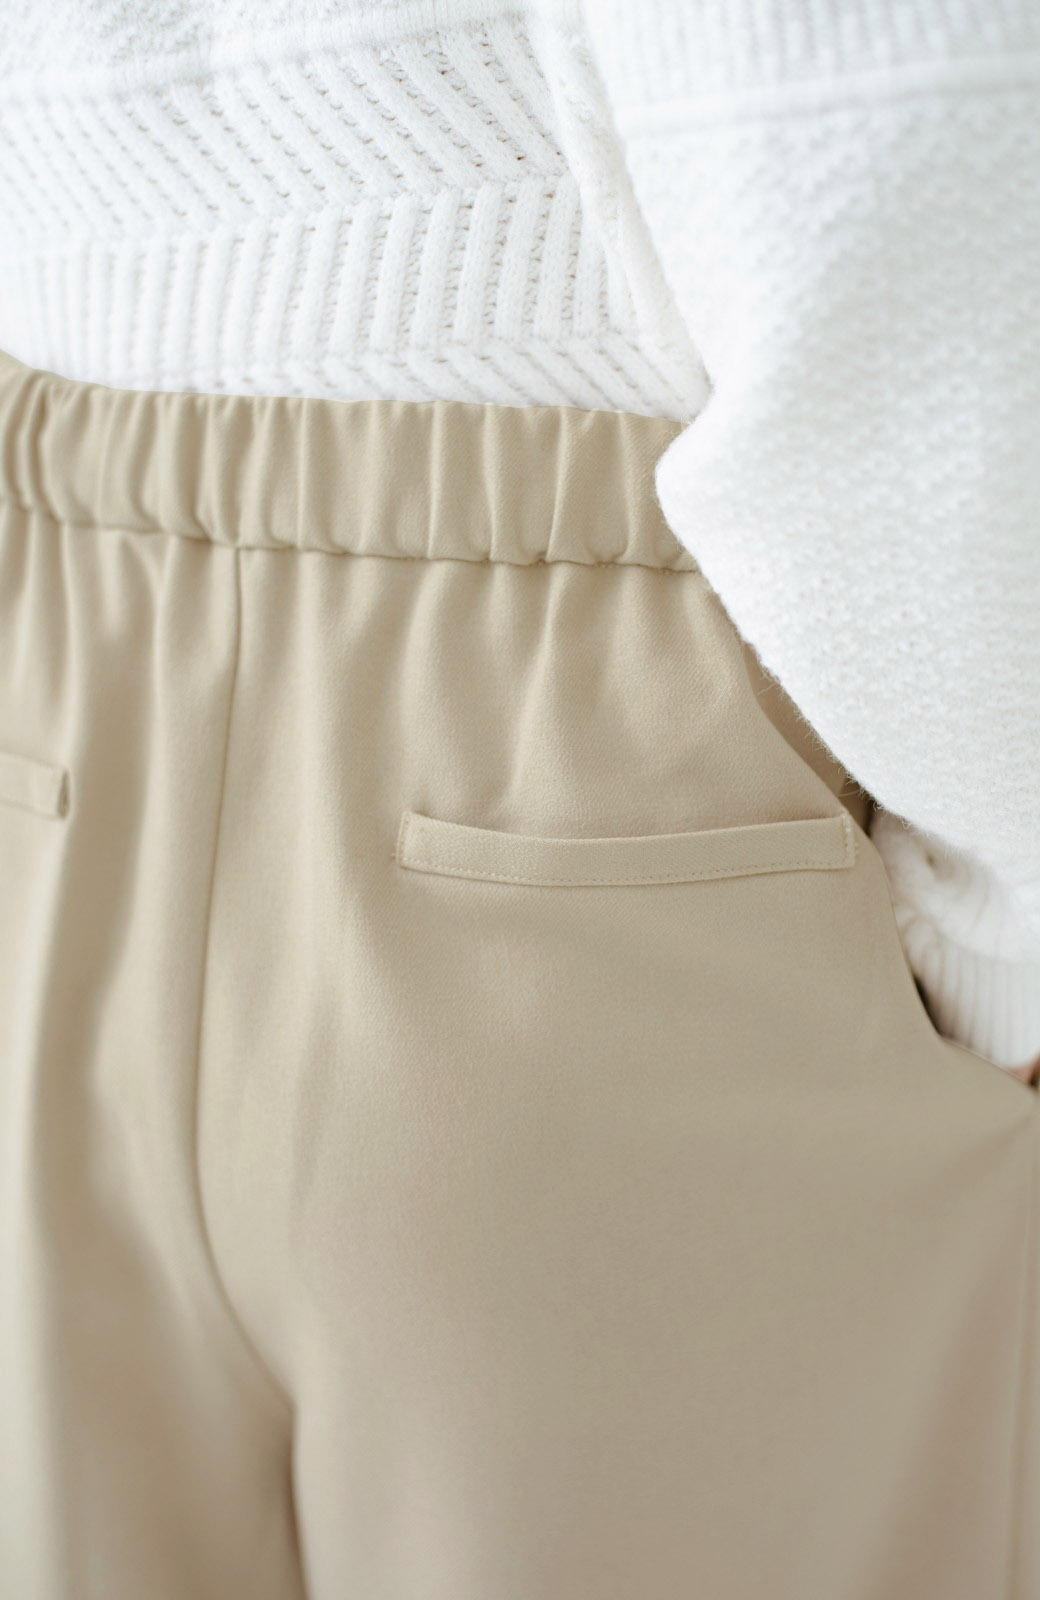 haco! 洗濯機で洗える ラップデザインワイドパンツ <ベージュ>の商品写真10